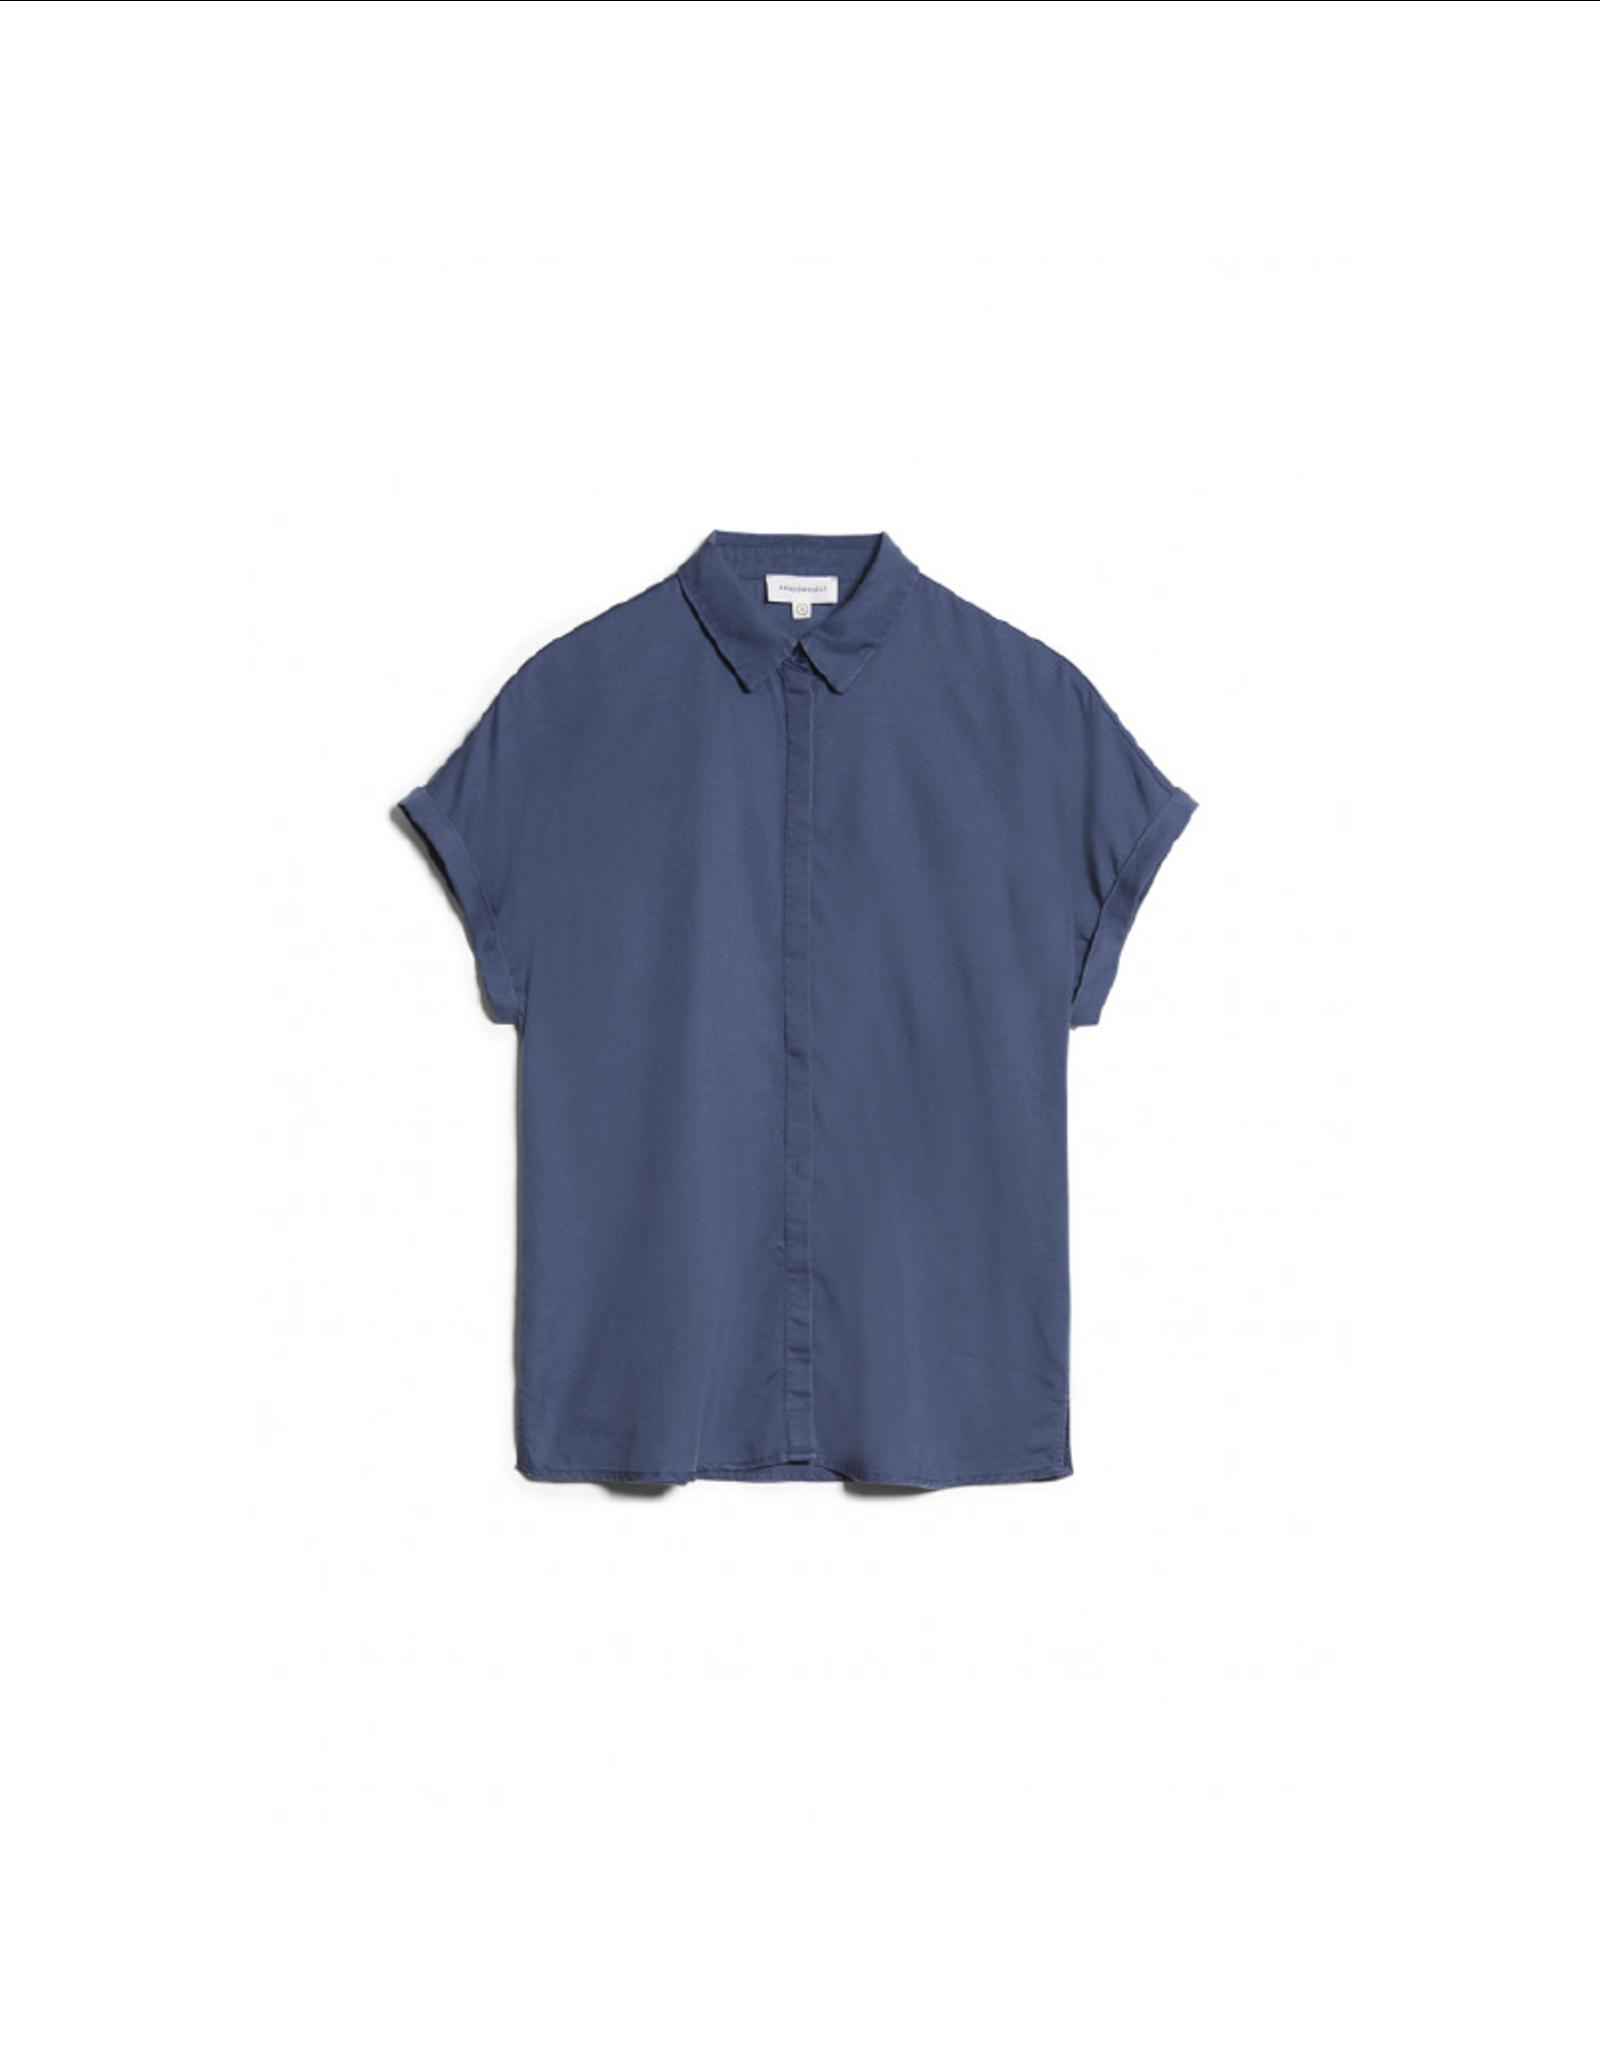 Armedangels Cap Sleeve Button-Up Top